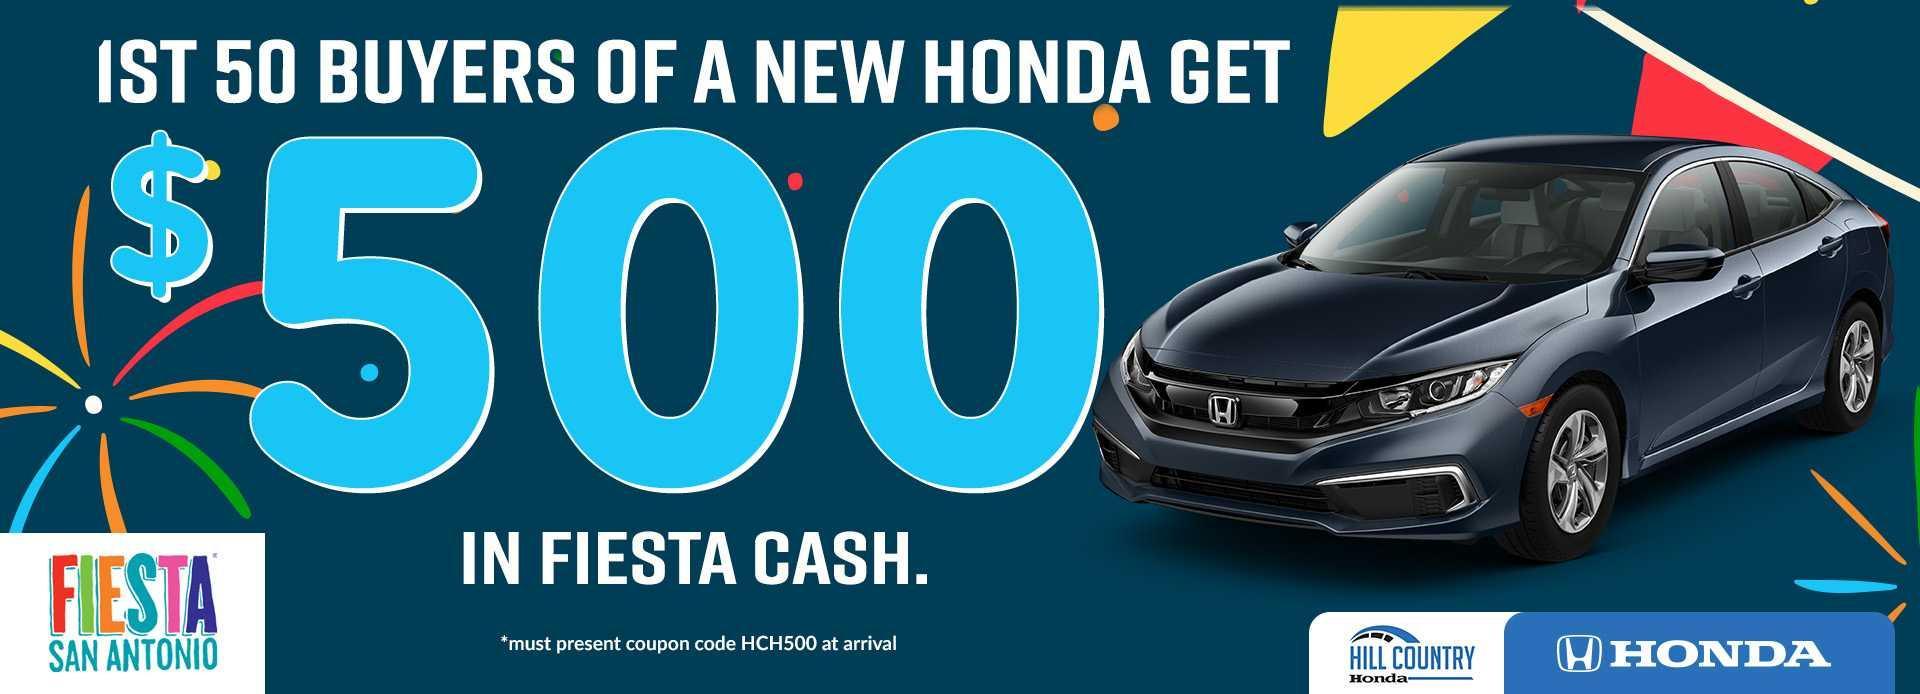 Fiesta Cash 2019 Honda Dream Garage